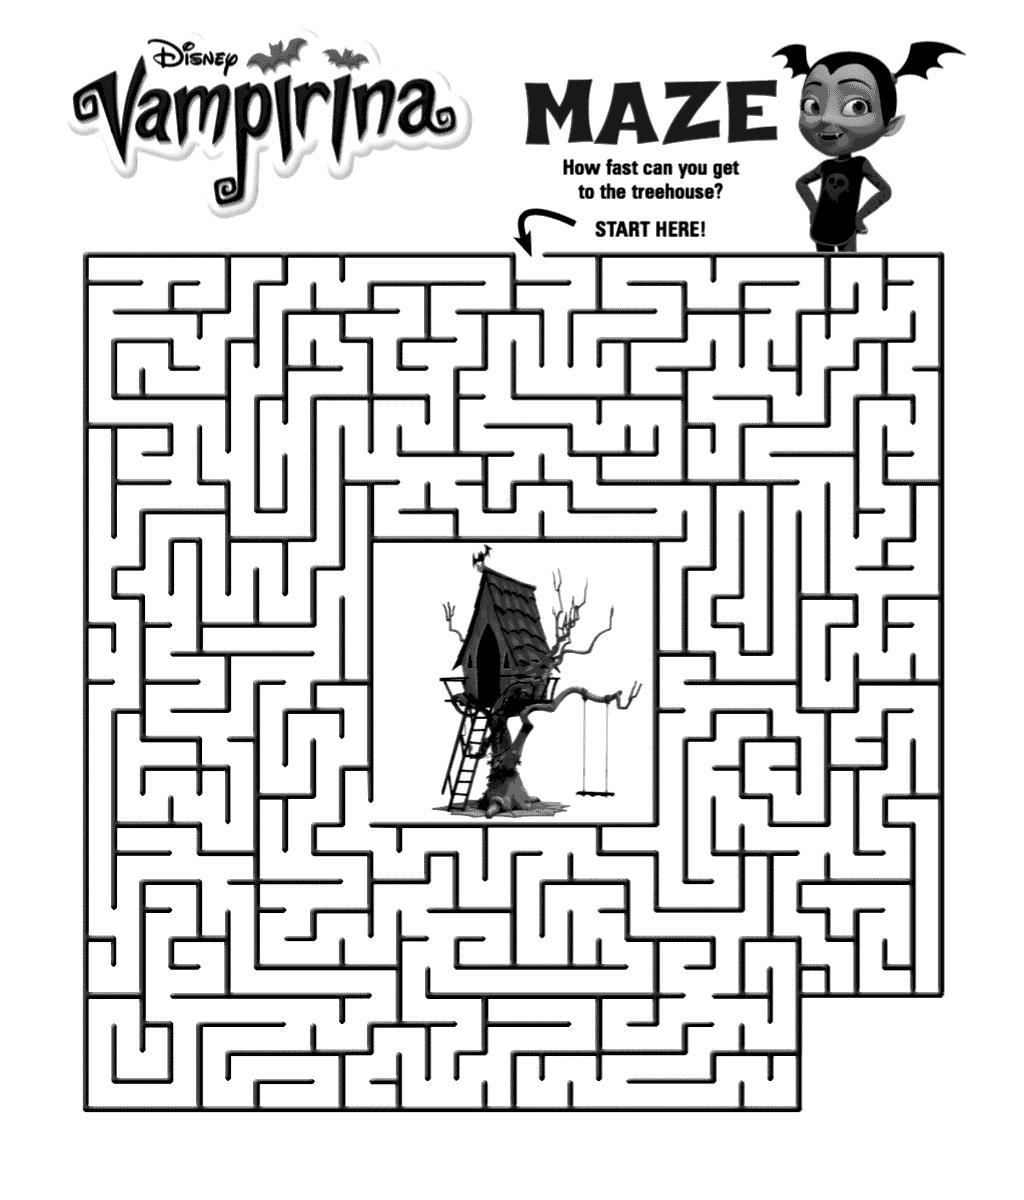 Vampirina Maze Activity Sheet Coloring Pages For Kids Coloring Pages Cute Coloring Pages